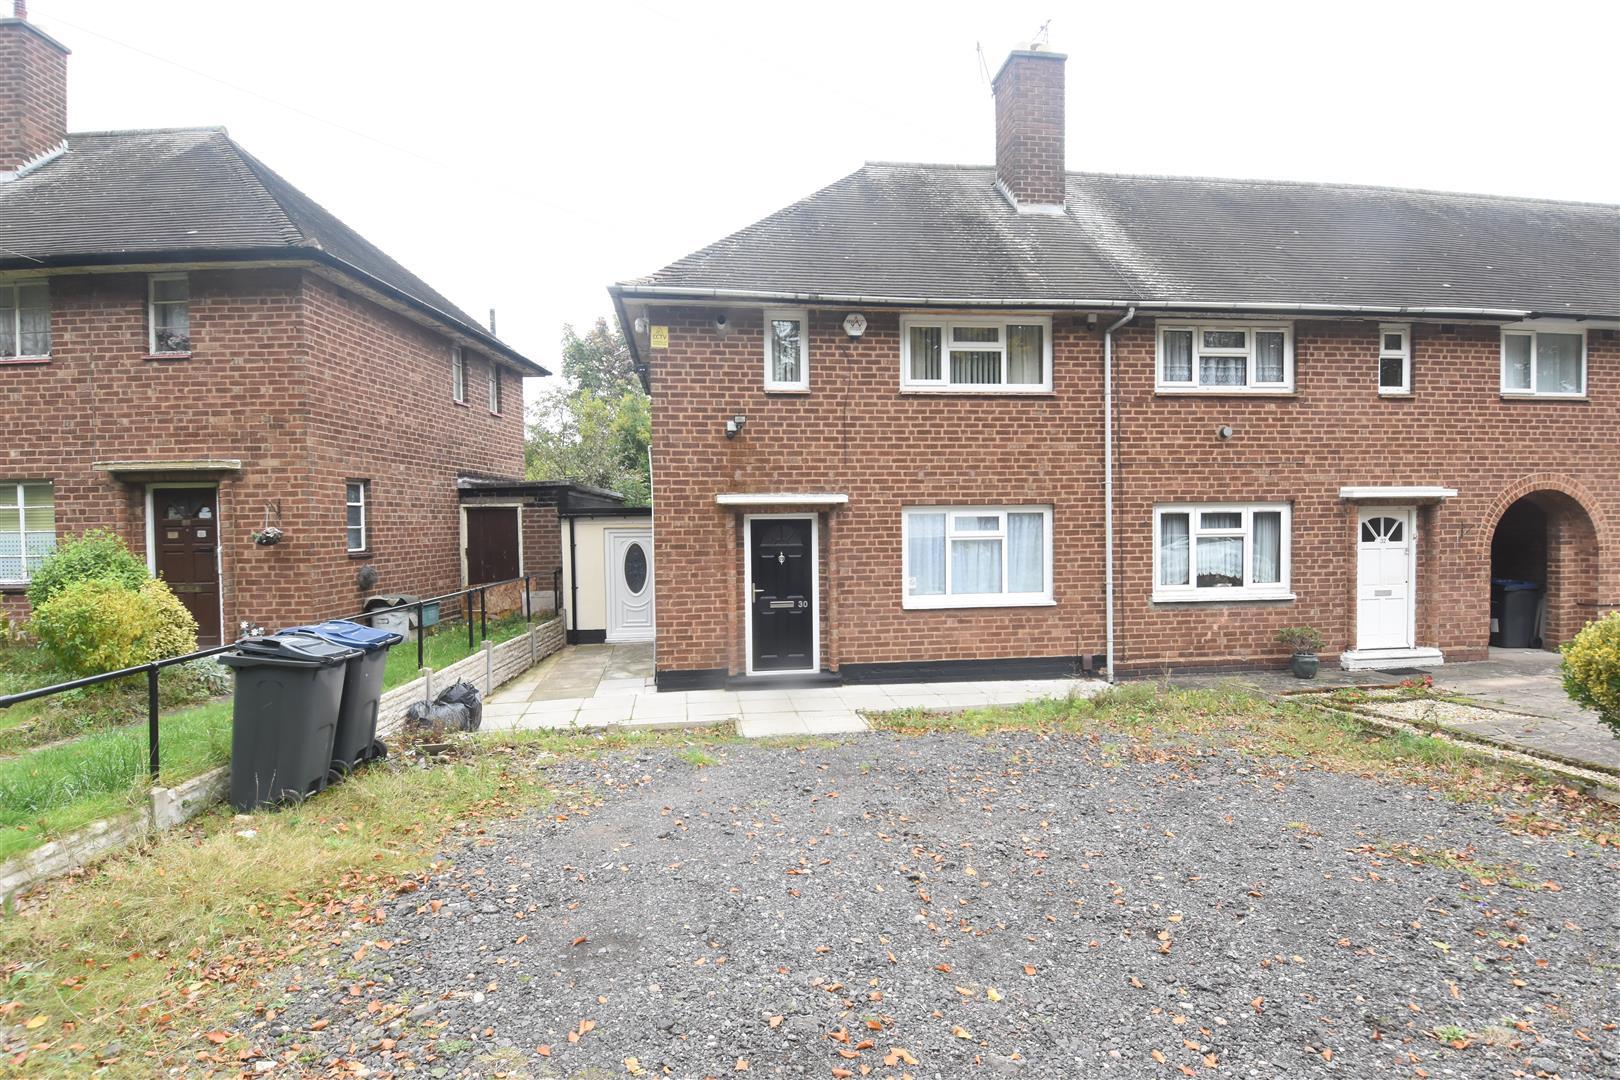 2 bed  for sale in 30 Wallbank Road, Ward End, Birmingham, B8, B8